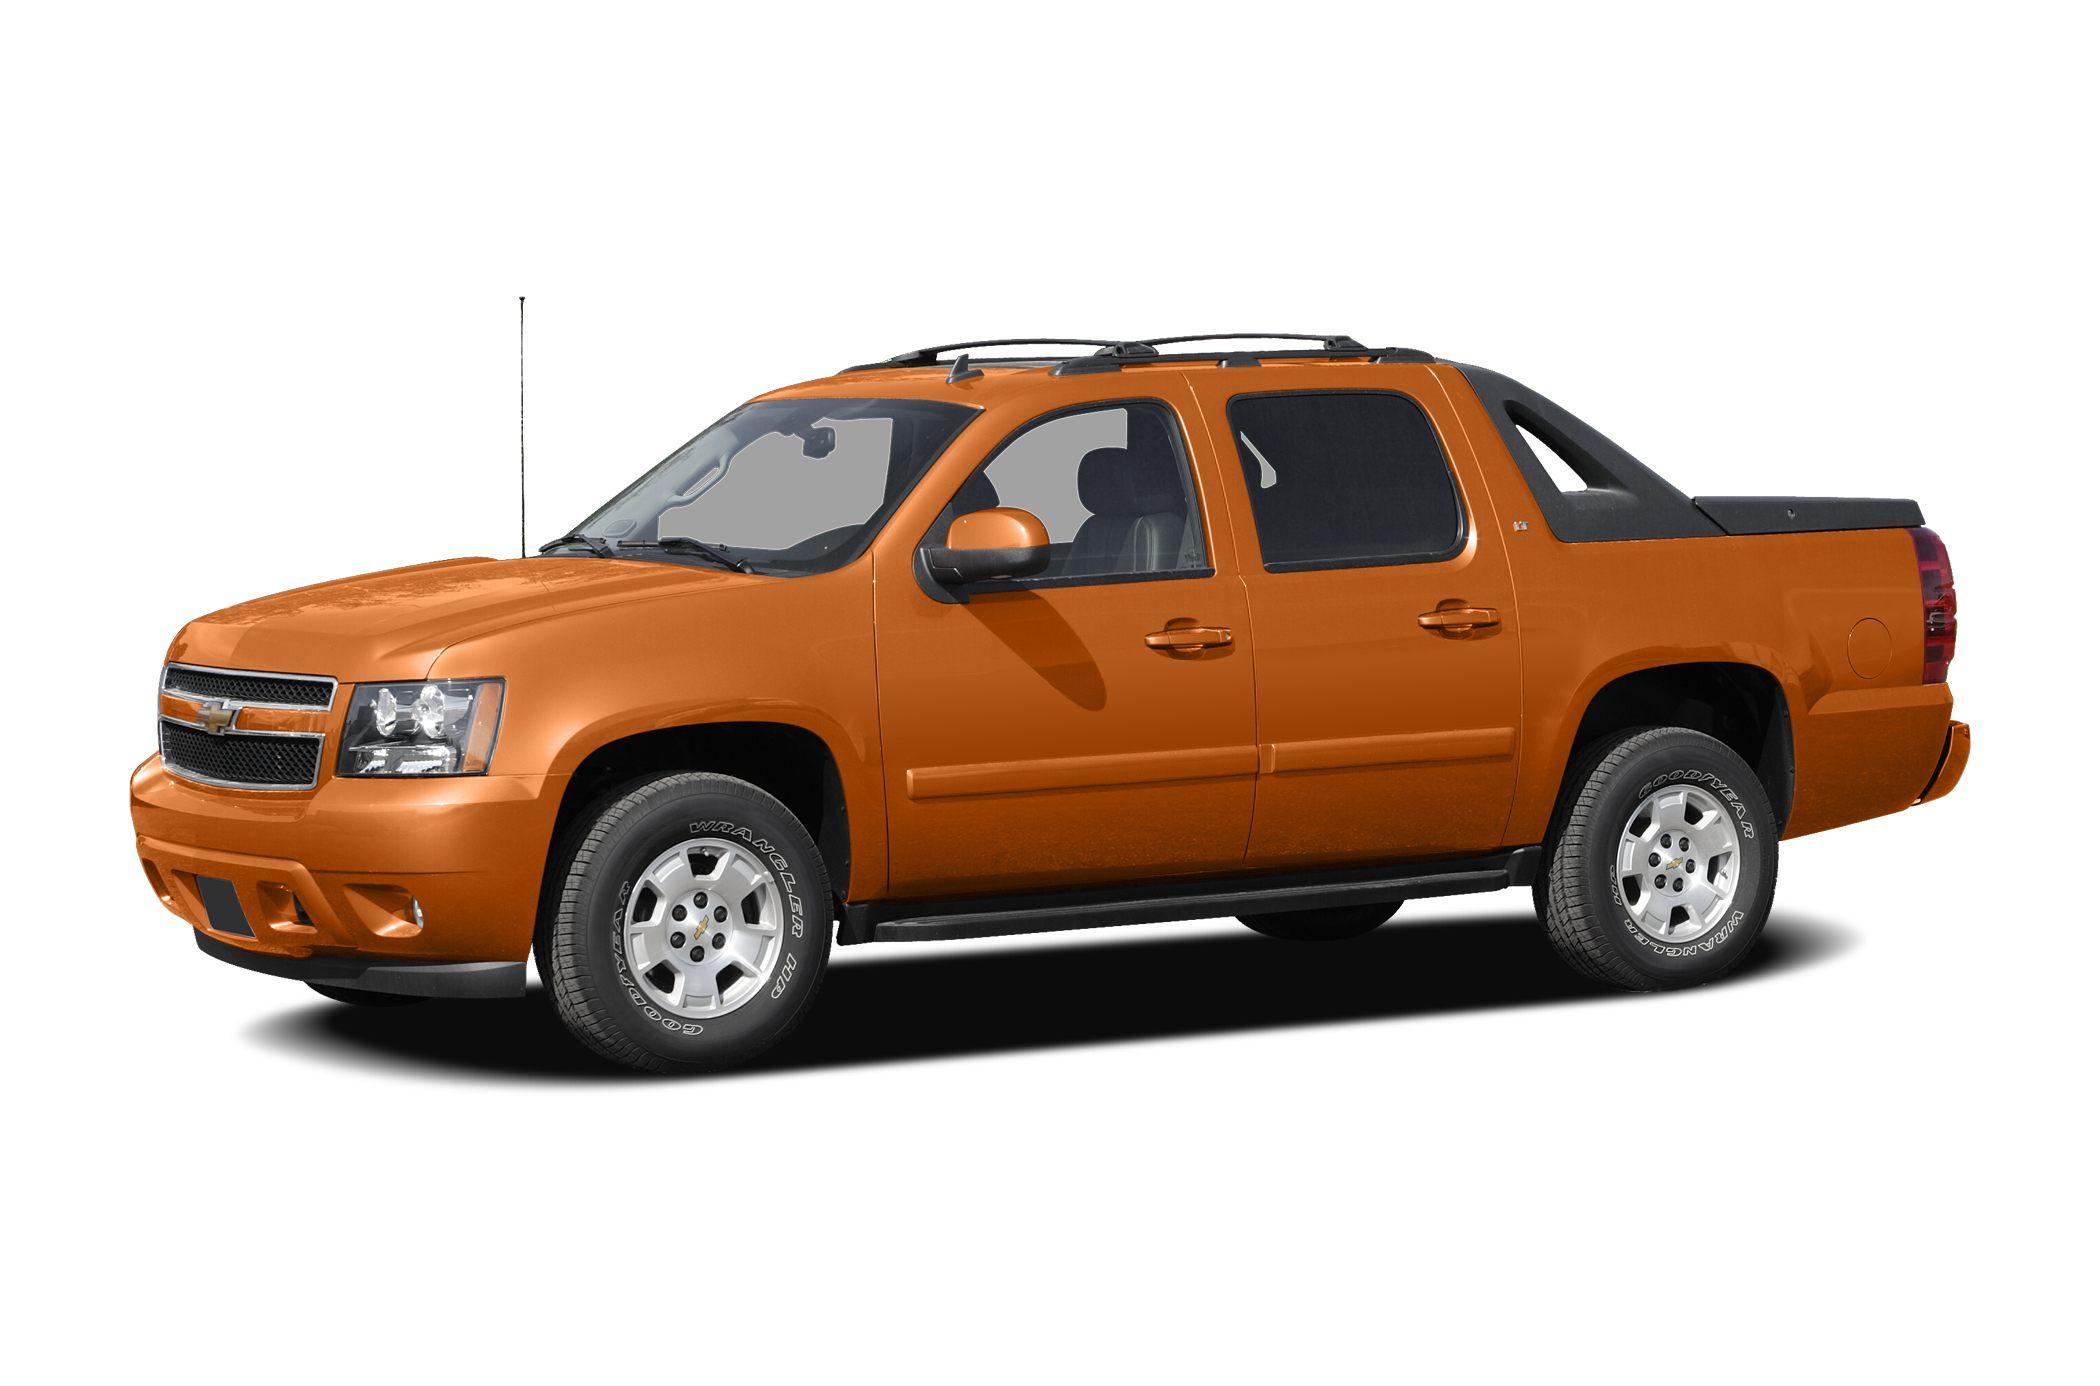 2007 Chevrolet Avalanche LTZ EPA 21 MPG Hwy15 MPG City 1000 below Kelley Blue Book Very Nice